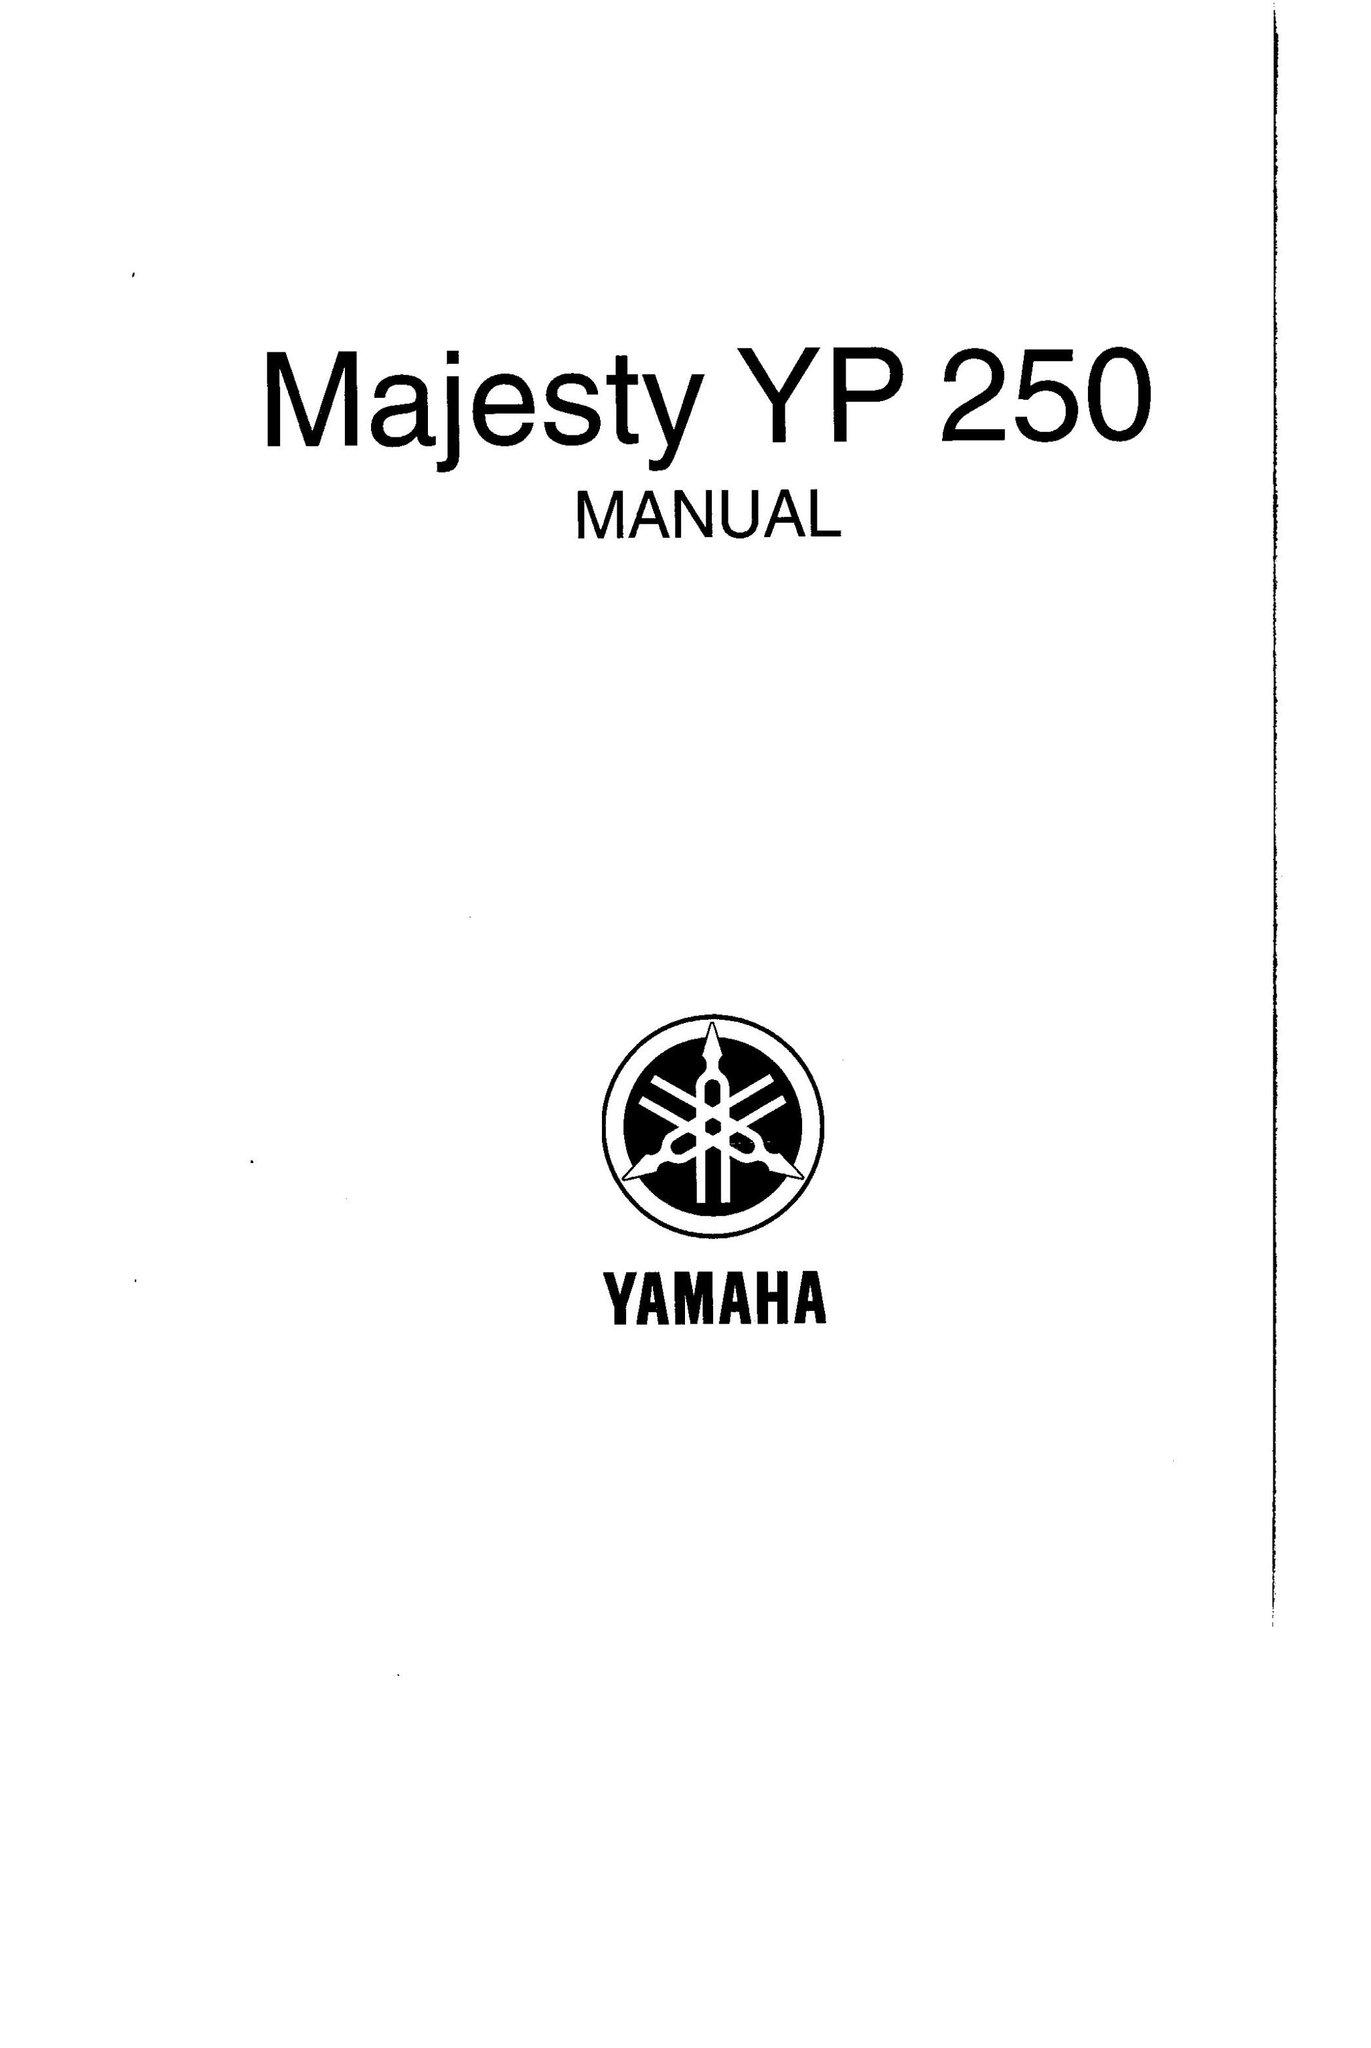 Manual Yamaha Majesty YP 250 (404568431) ᐈ Köp på Tradera